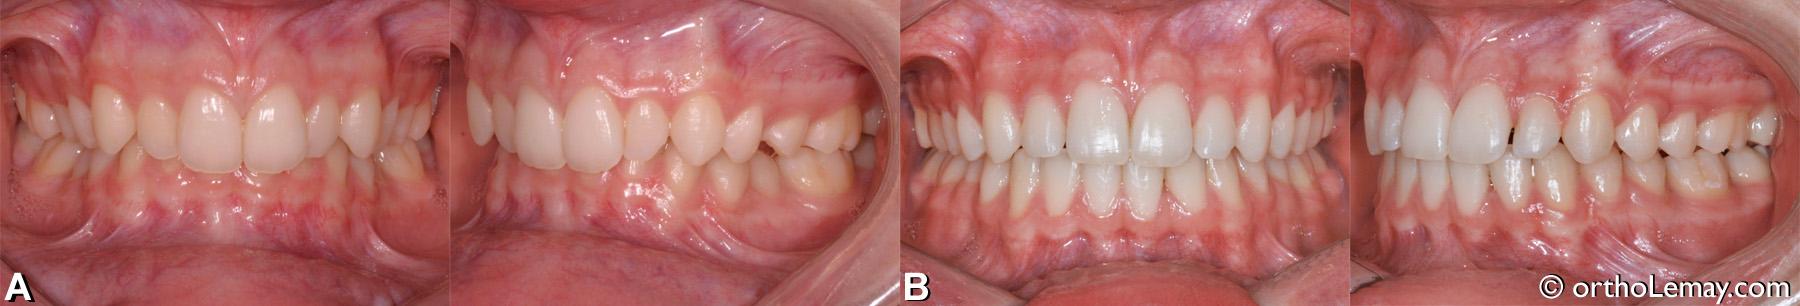 Malocclusion dentaire classe 2, supraclusion, overbite excessif, latérales étroites.